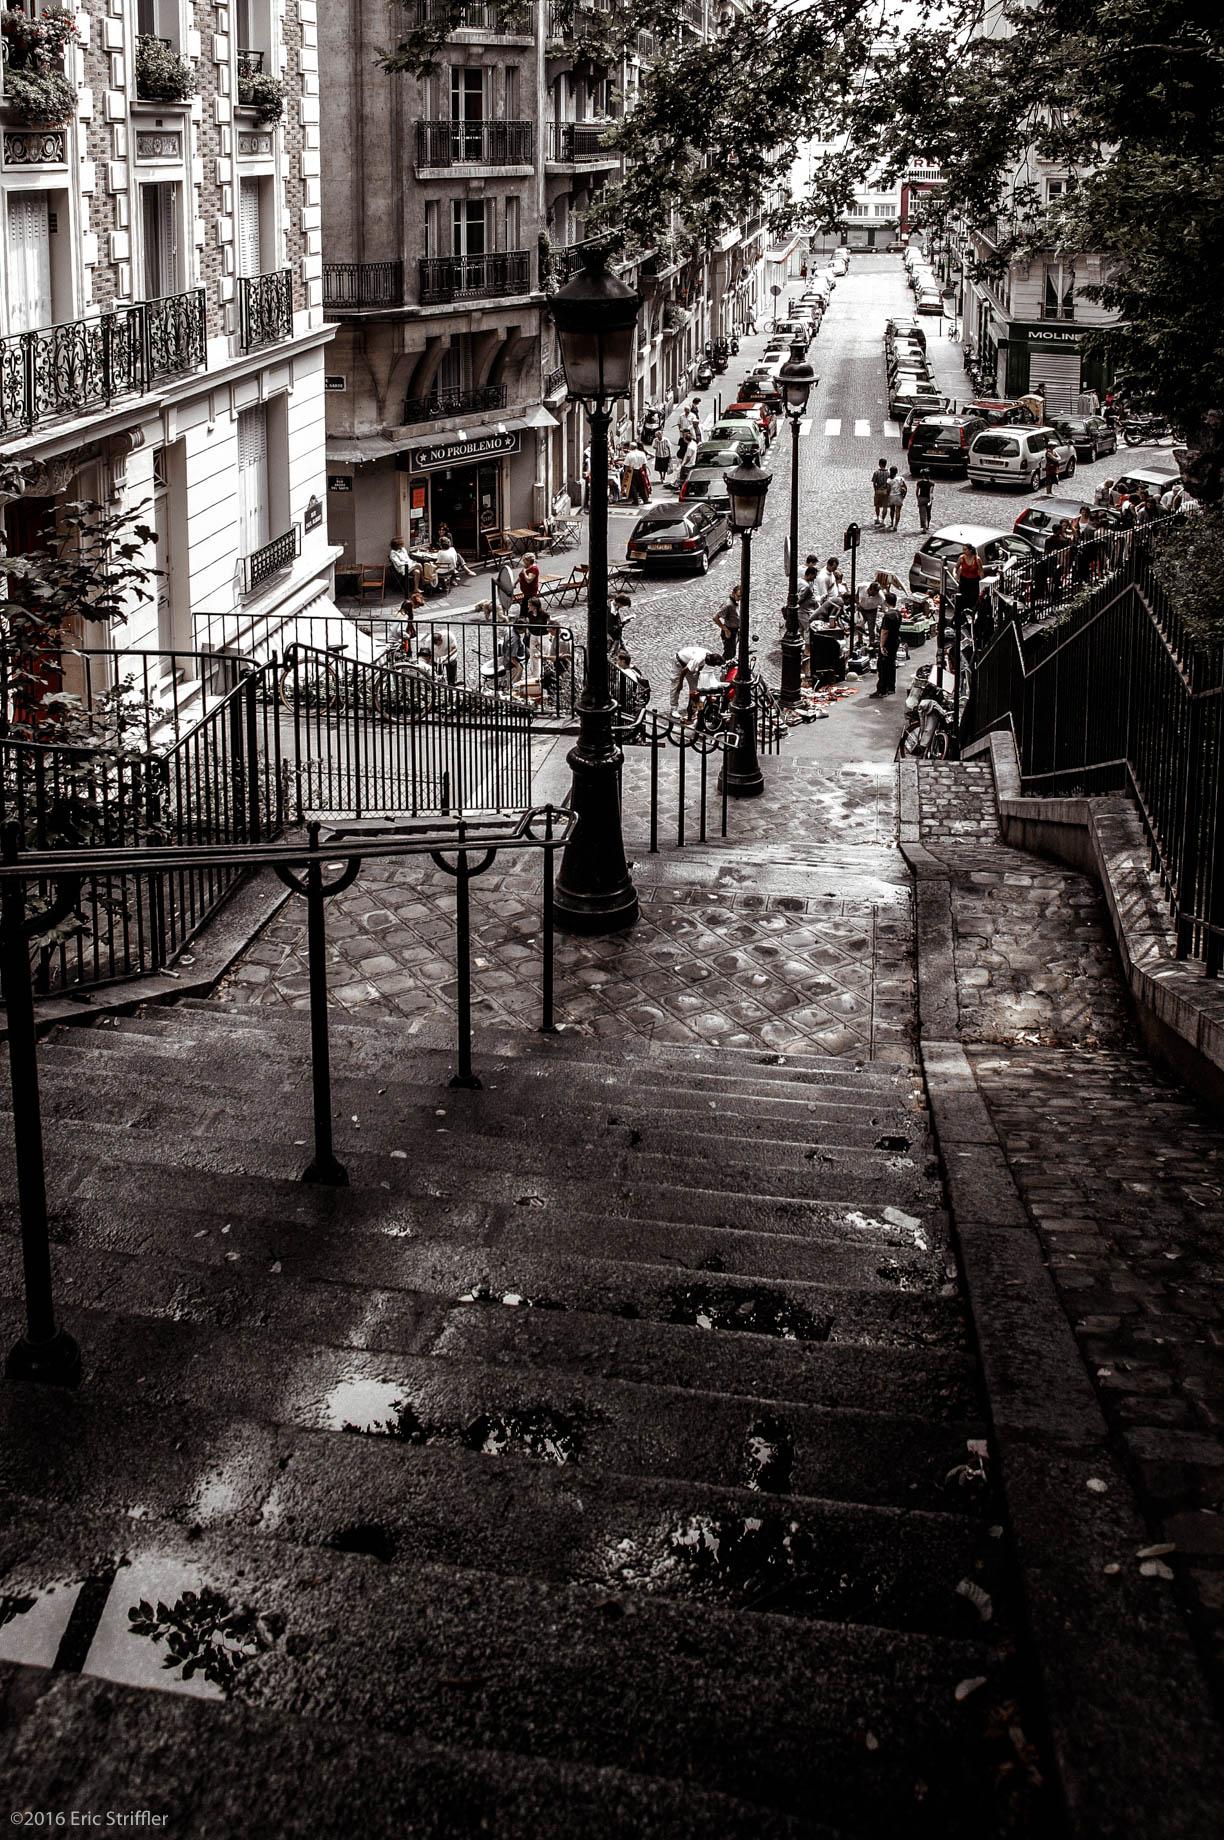 eric_striffler_photography_travel-65.jpg